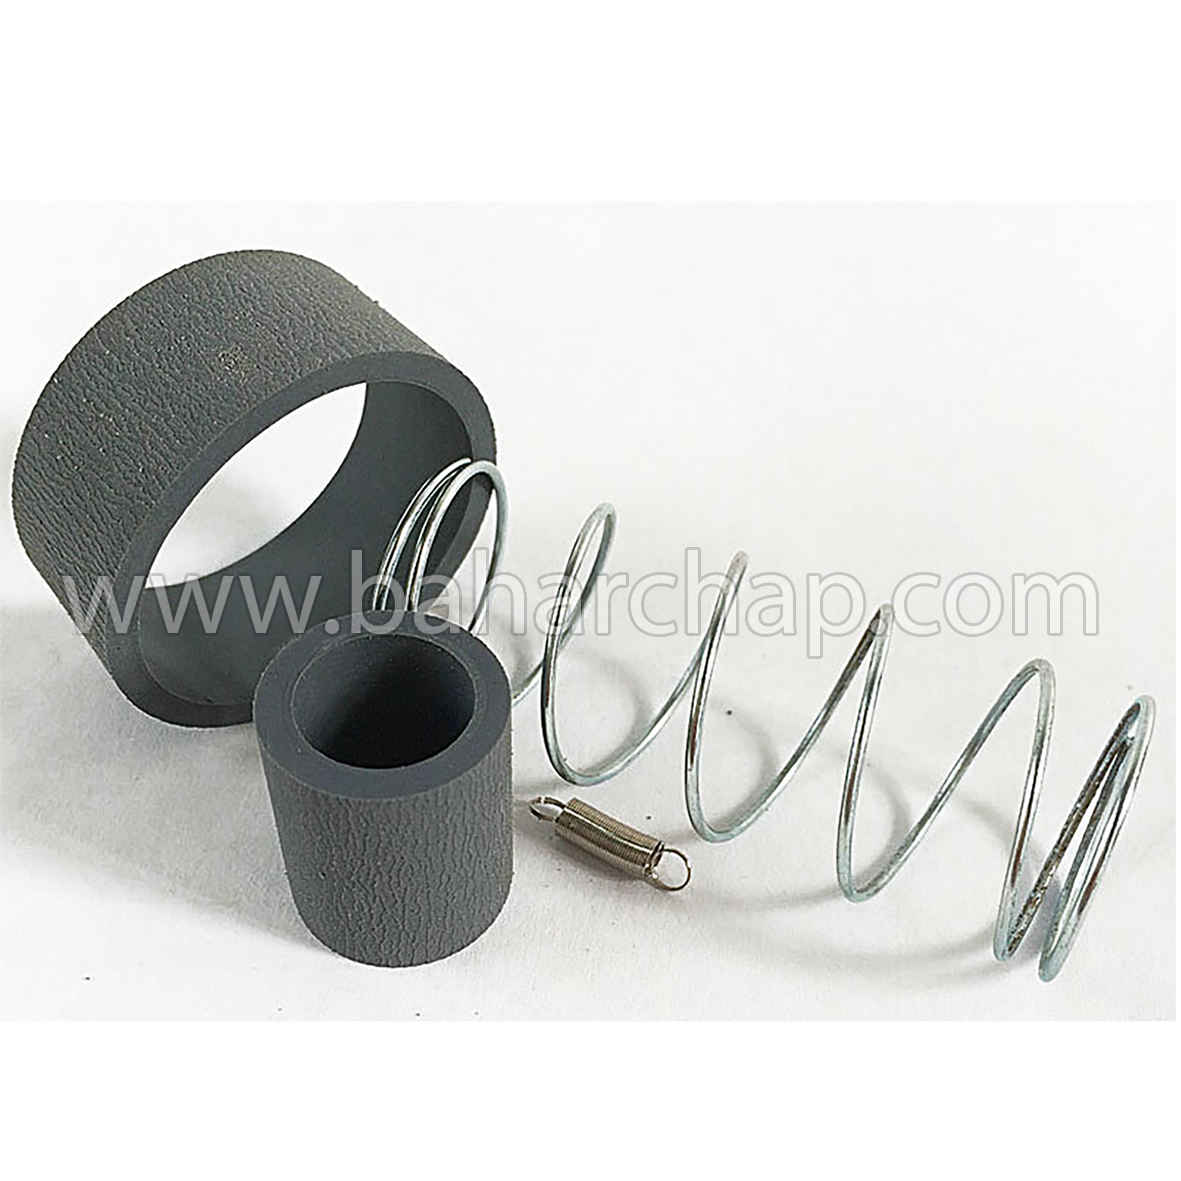 فروشگاه و خدمات اینترنتی بهارچاپ اصفهان-کاغذ کش اصلی اپسون T50 P50 T59 T60 L801 R330-Printer Paper Pickup Roller Compatible for Epson T50 P50 T59 T60 L801 R330 Pickup Rollers